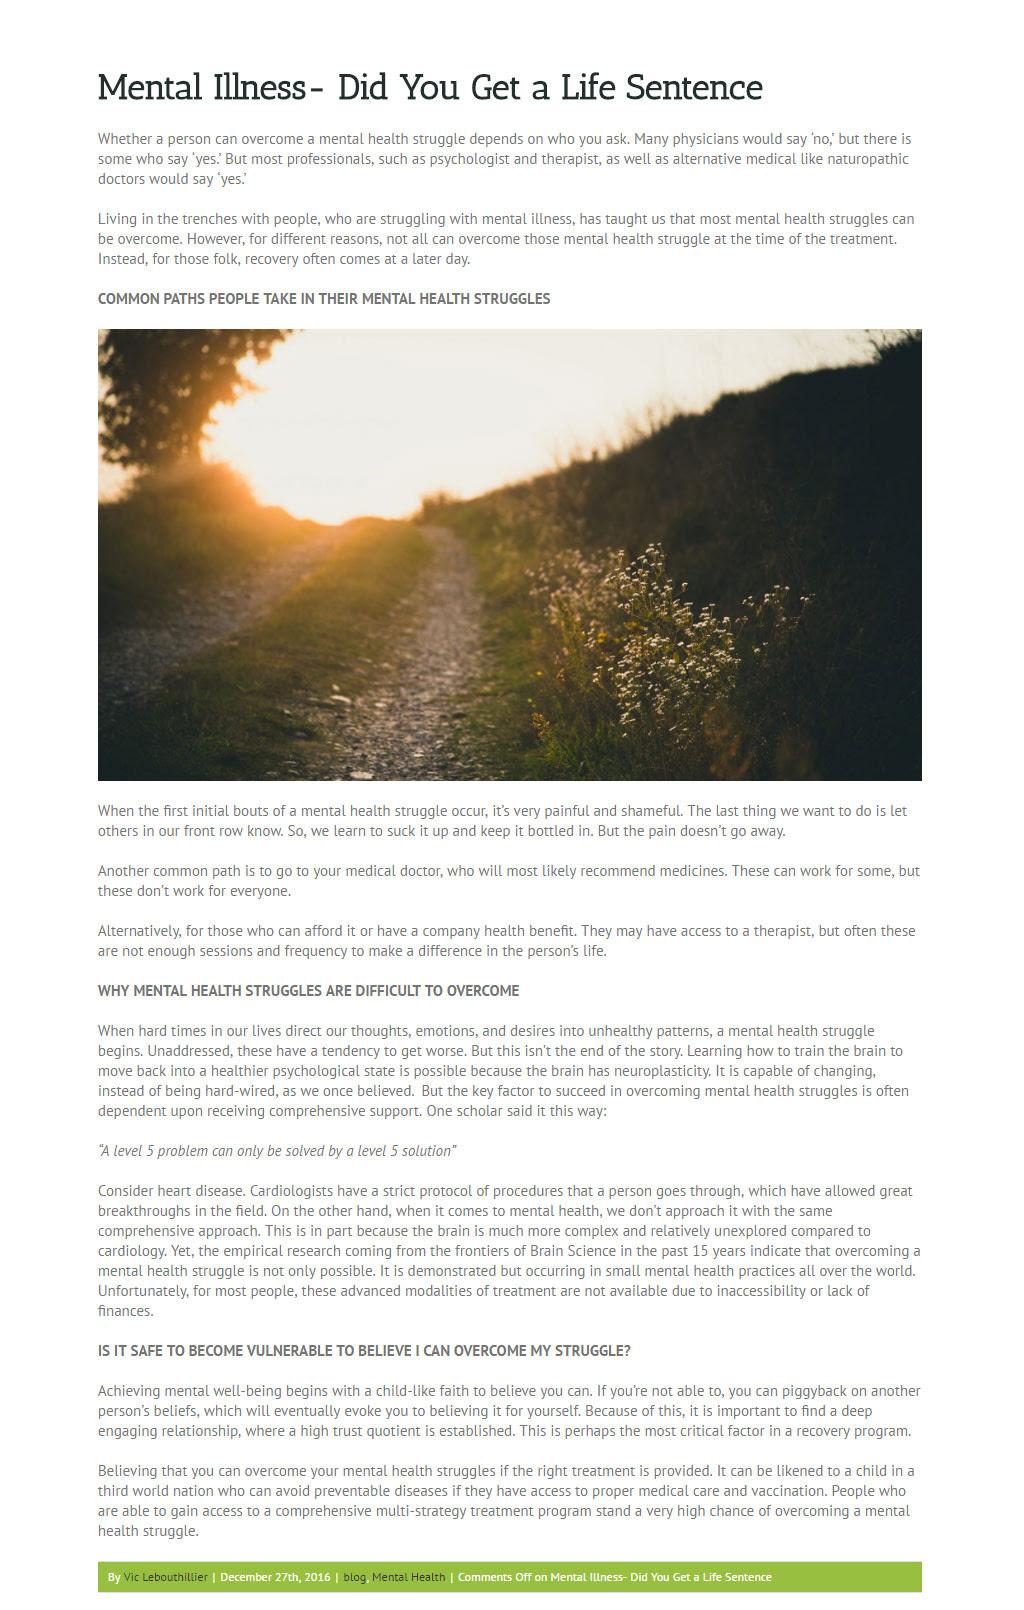 Mental Illness- Did You Get a Life Sentence - Build Strong ...